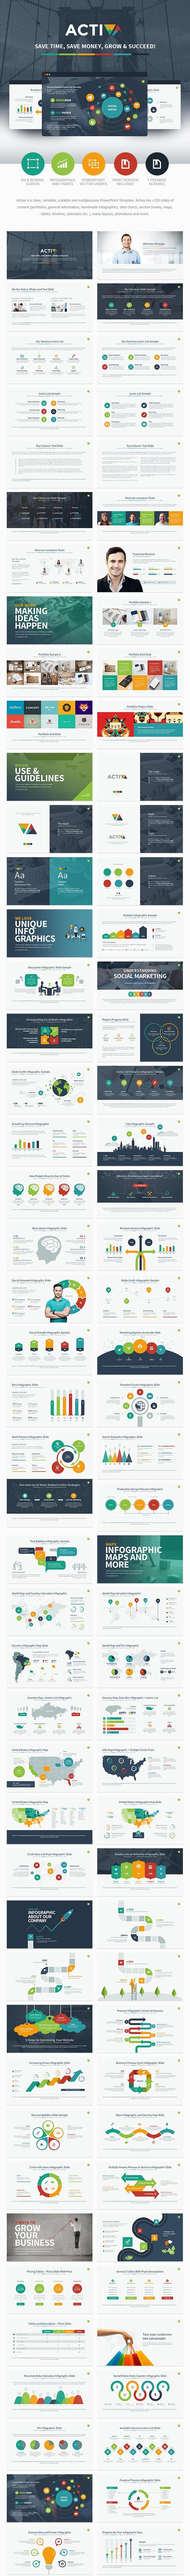 Activa Powerpoint Presentation Template - Creative PowerPoint Templates